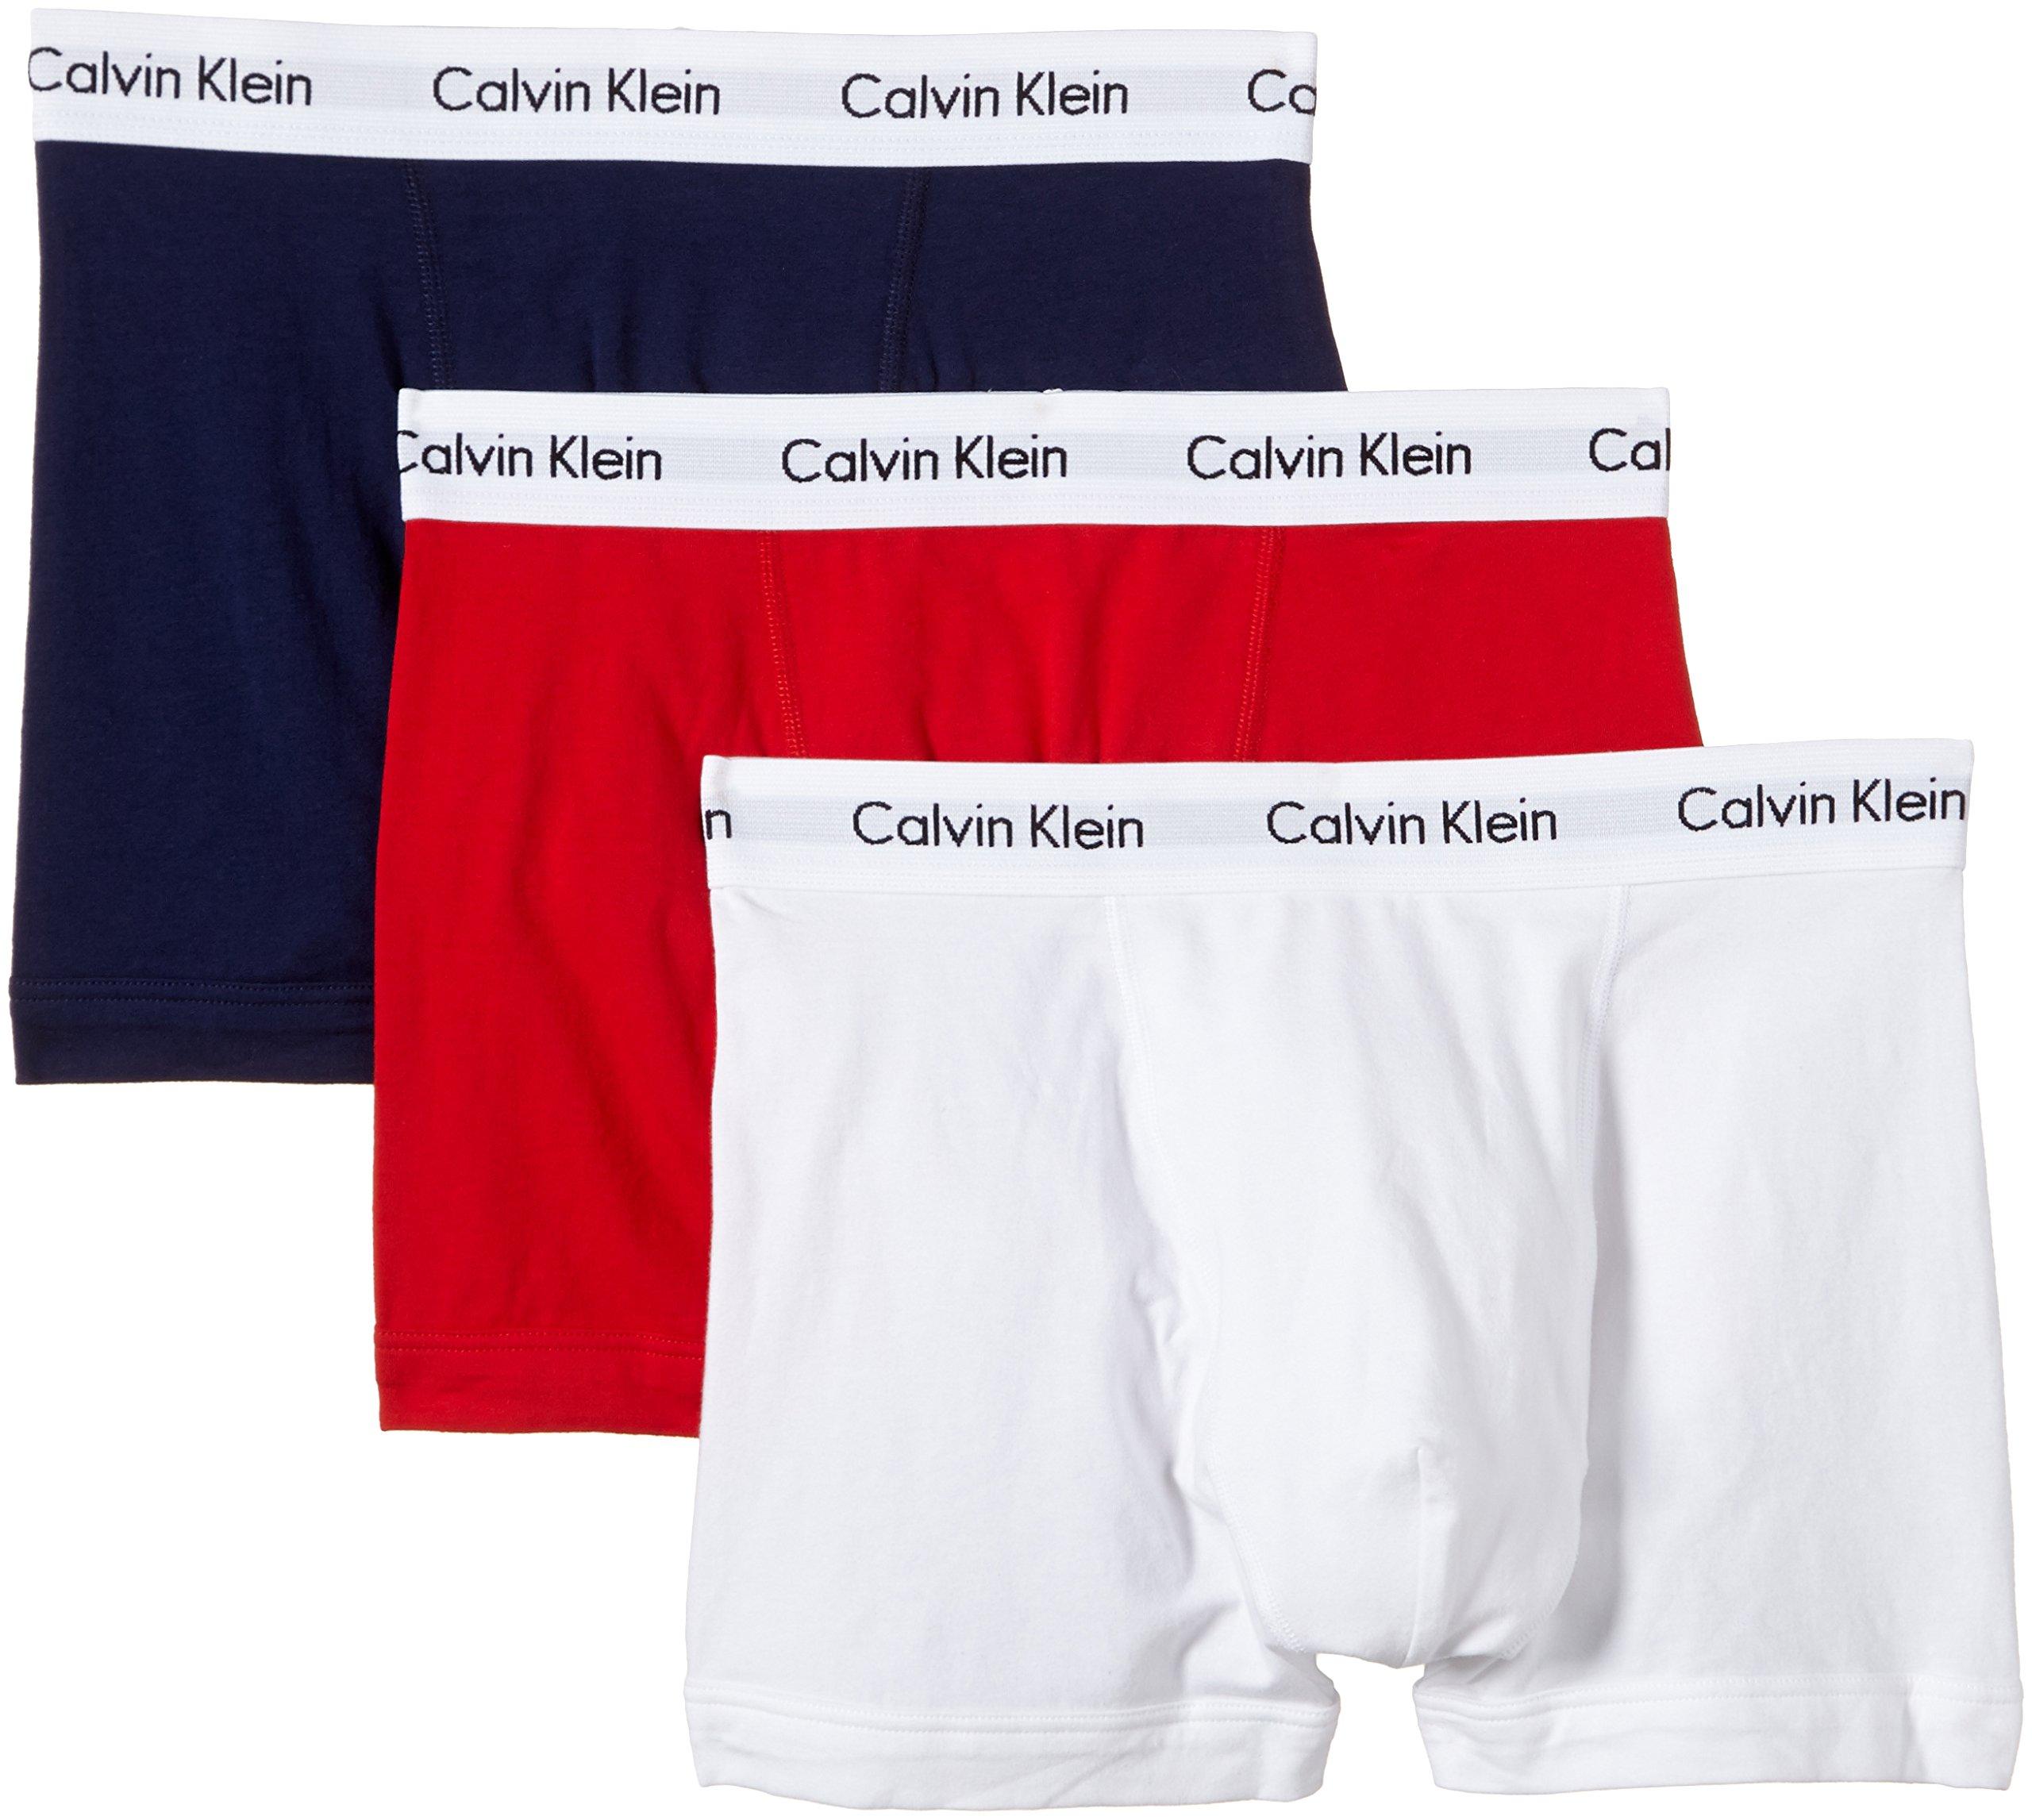 Calvin Klein Cotton Stretch Multi Pack Trunks - White/Red/Blue